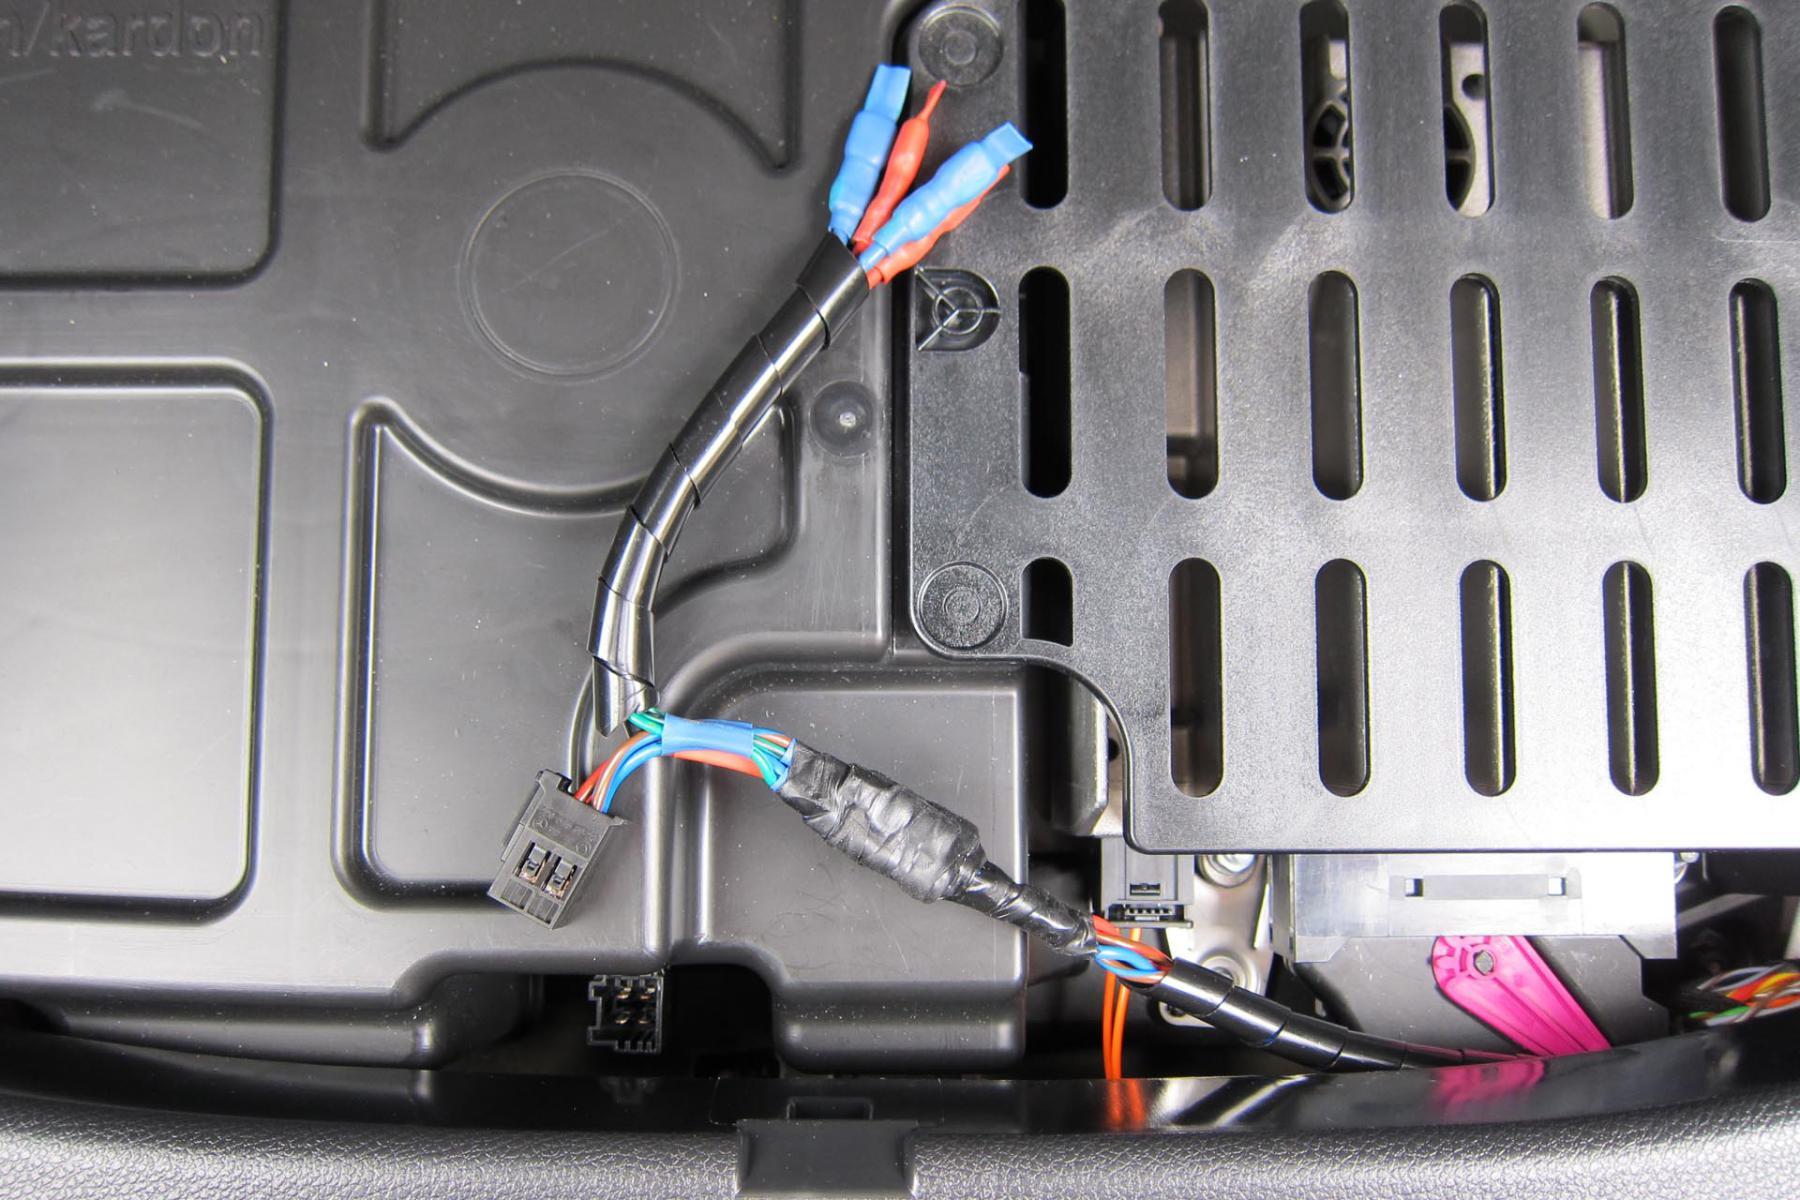 custom audio in gla page 3 mercedes gla forum rh glaowners com Custom Built Wiring Harness Custom Auto Wiring Kits